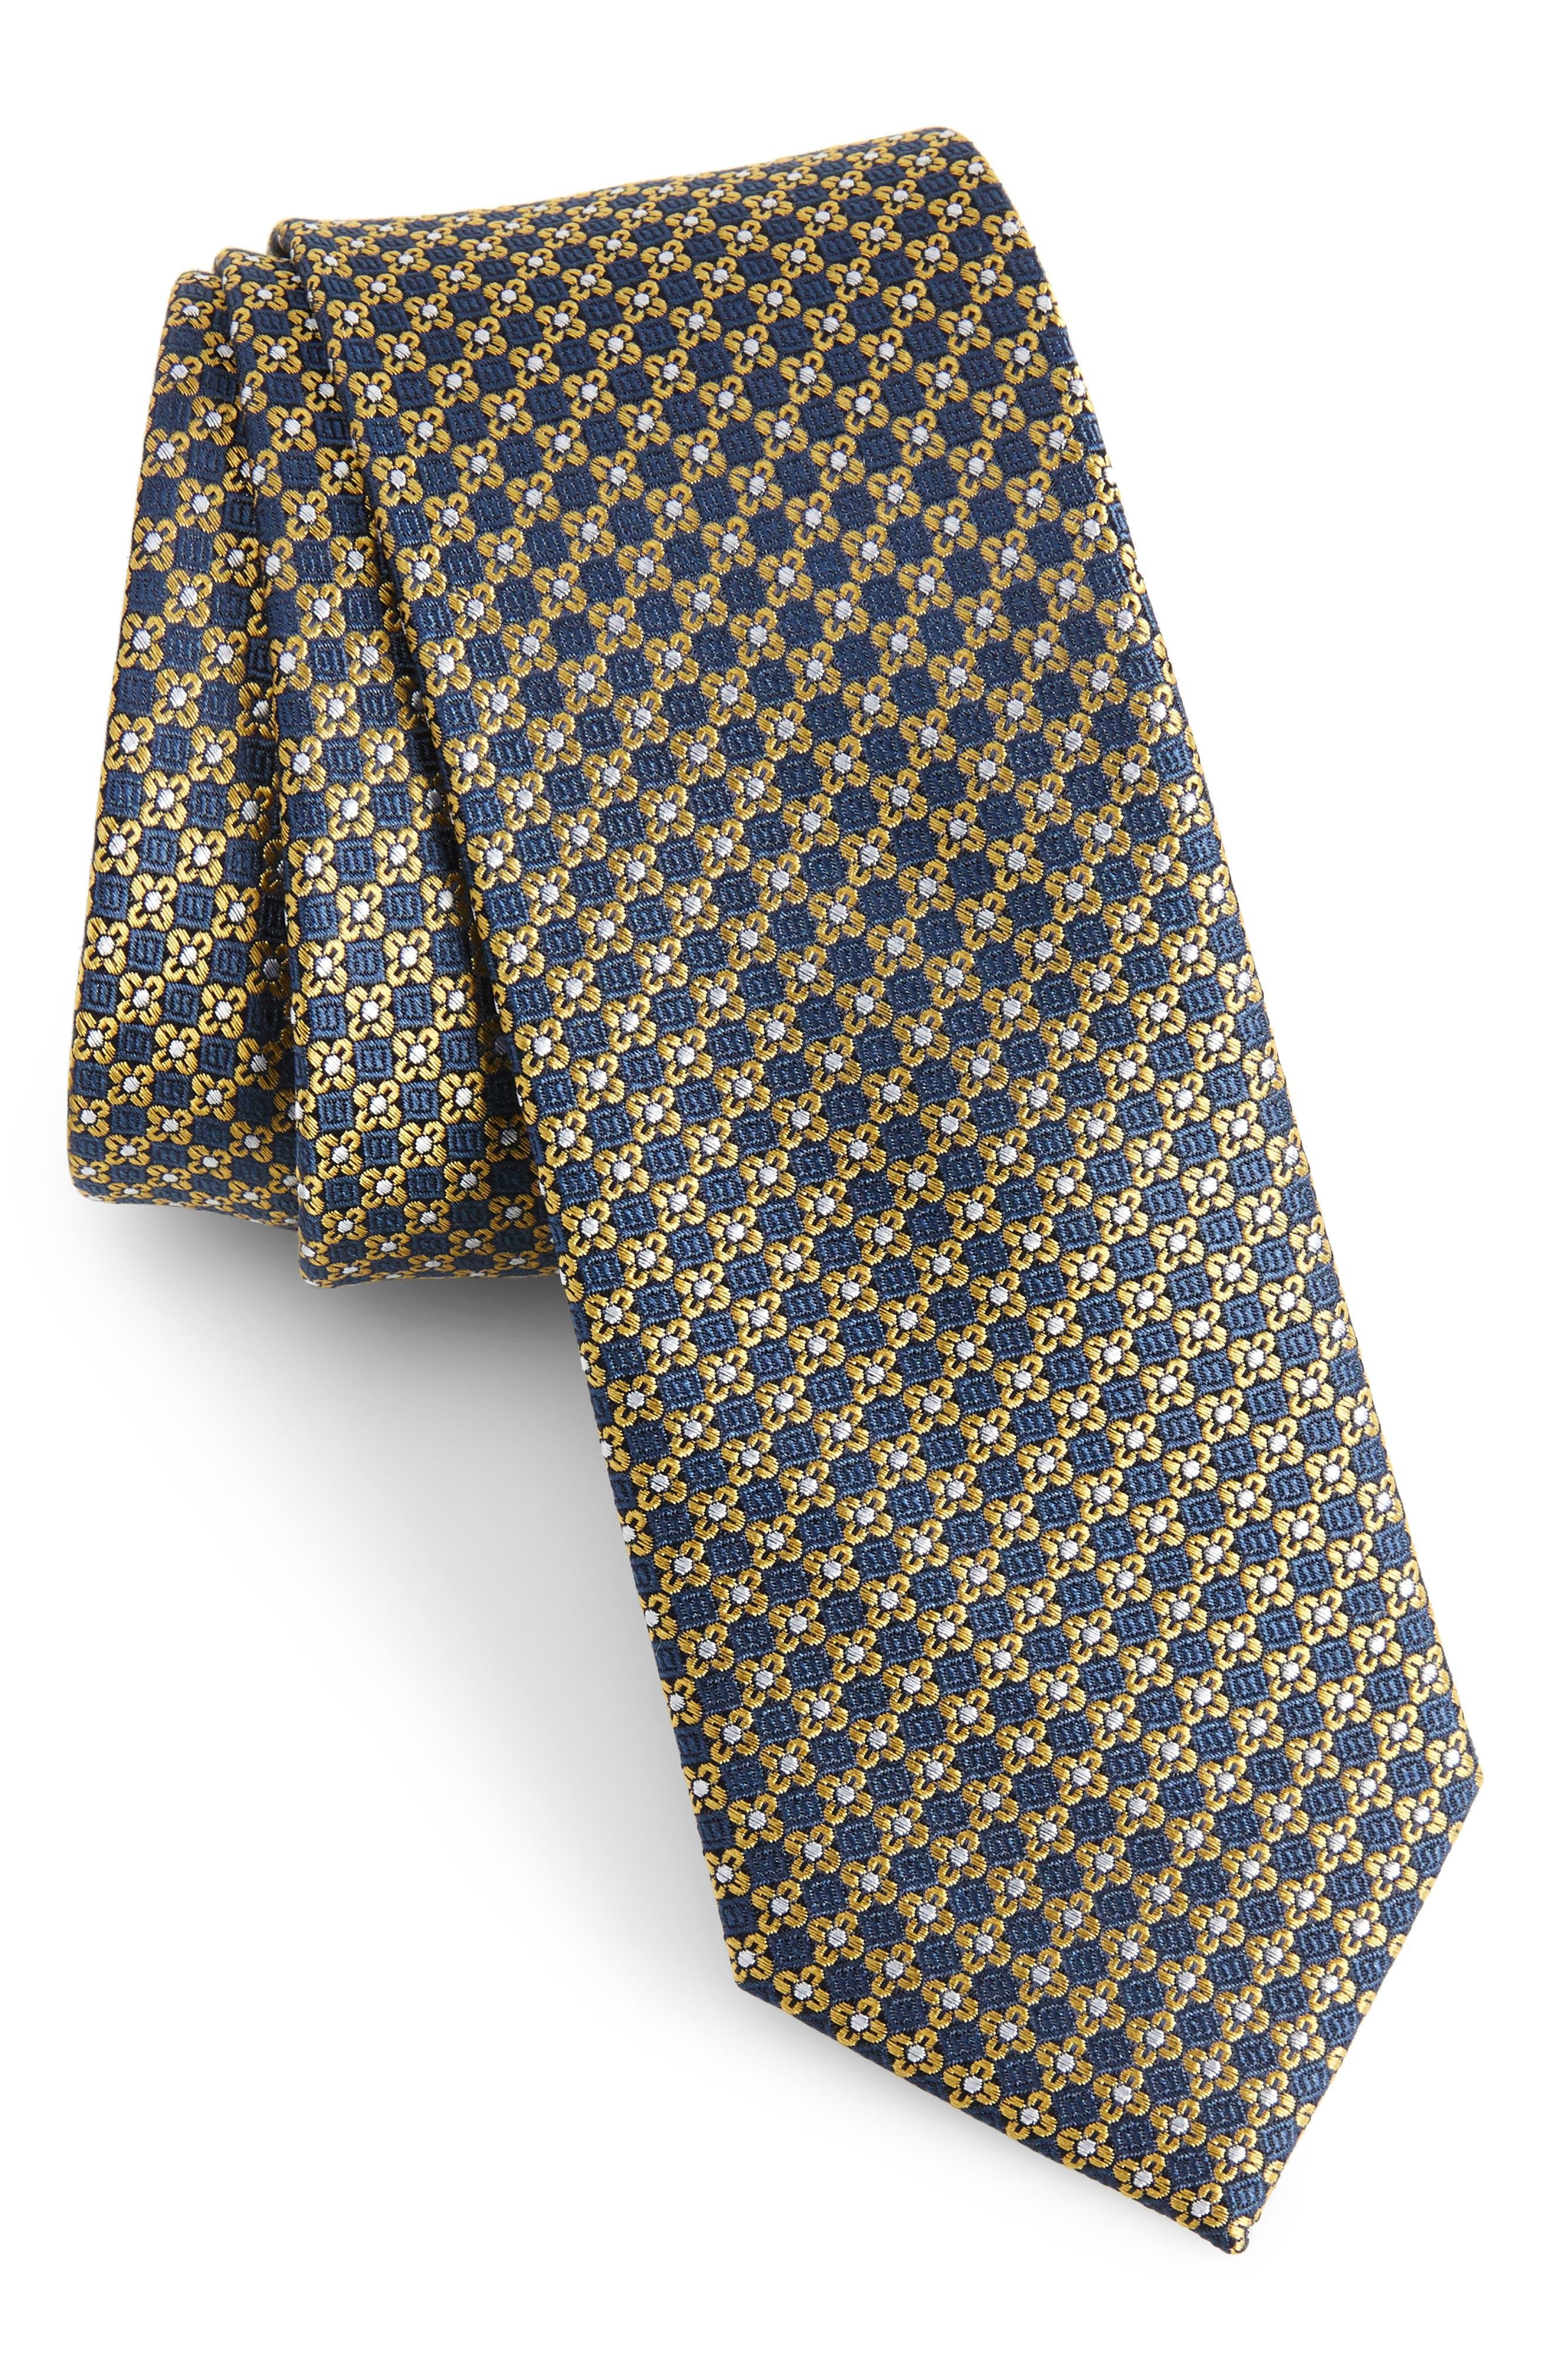 Main Image - The Tie Bar Floral Network Silk Skinny Tie